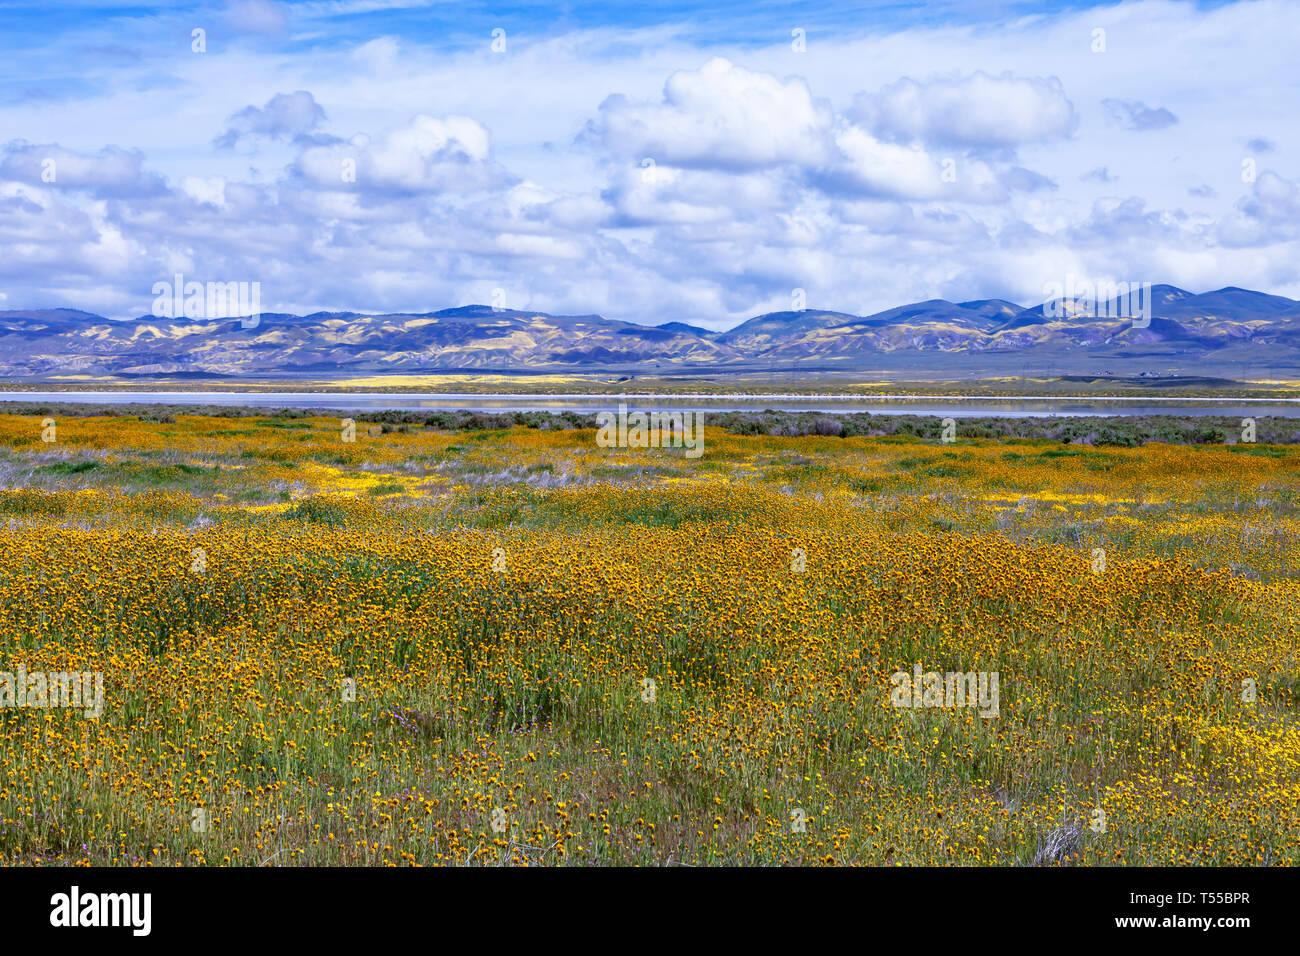 Wildflowers bloom surrounding Soda Lake in California's Carrizo National Monument - Stock Image